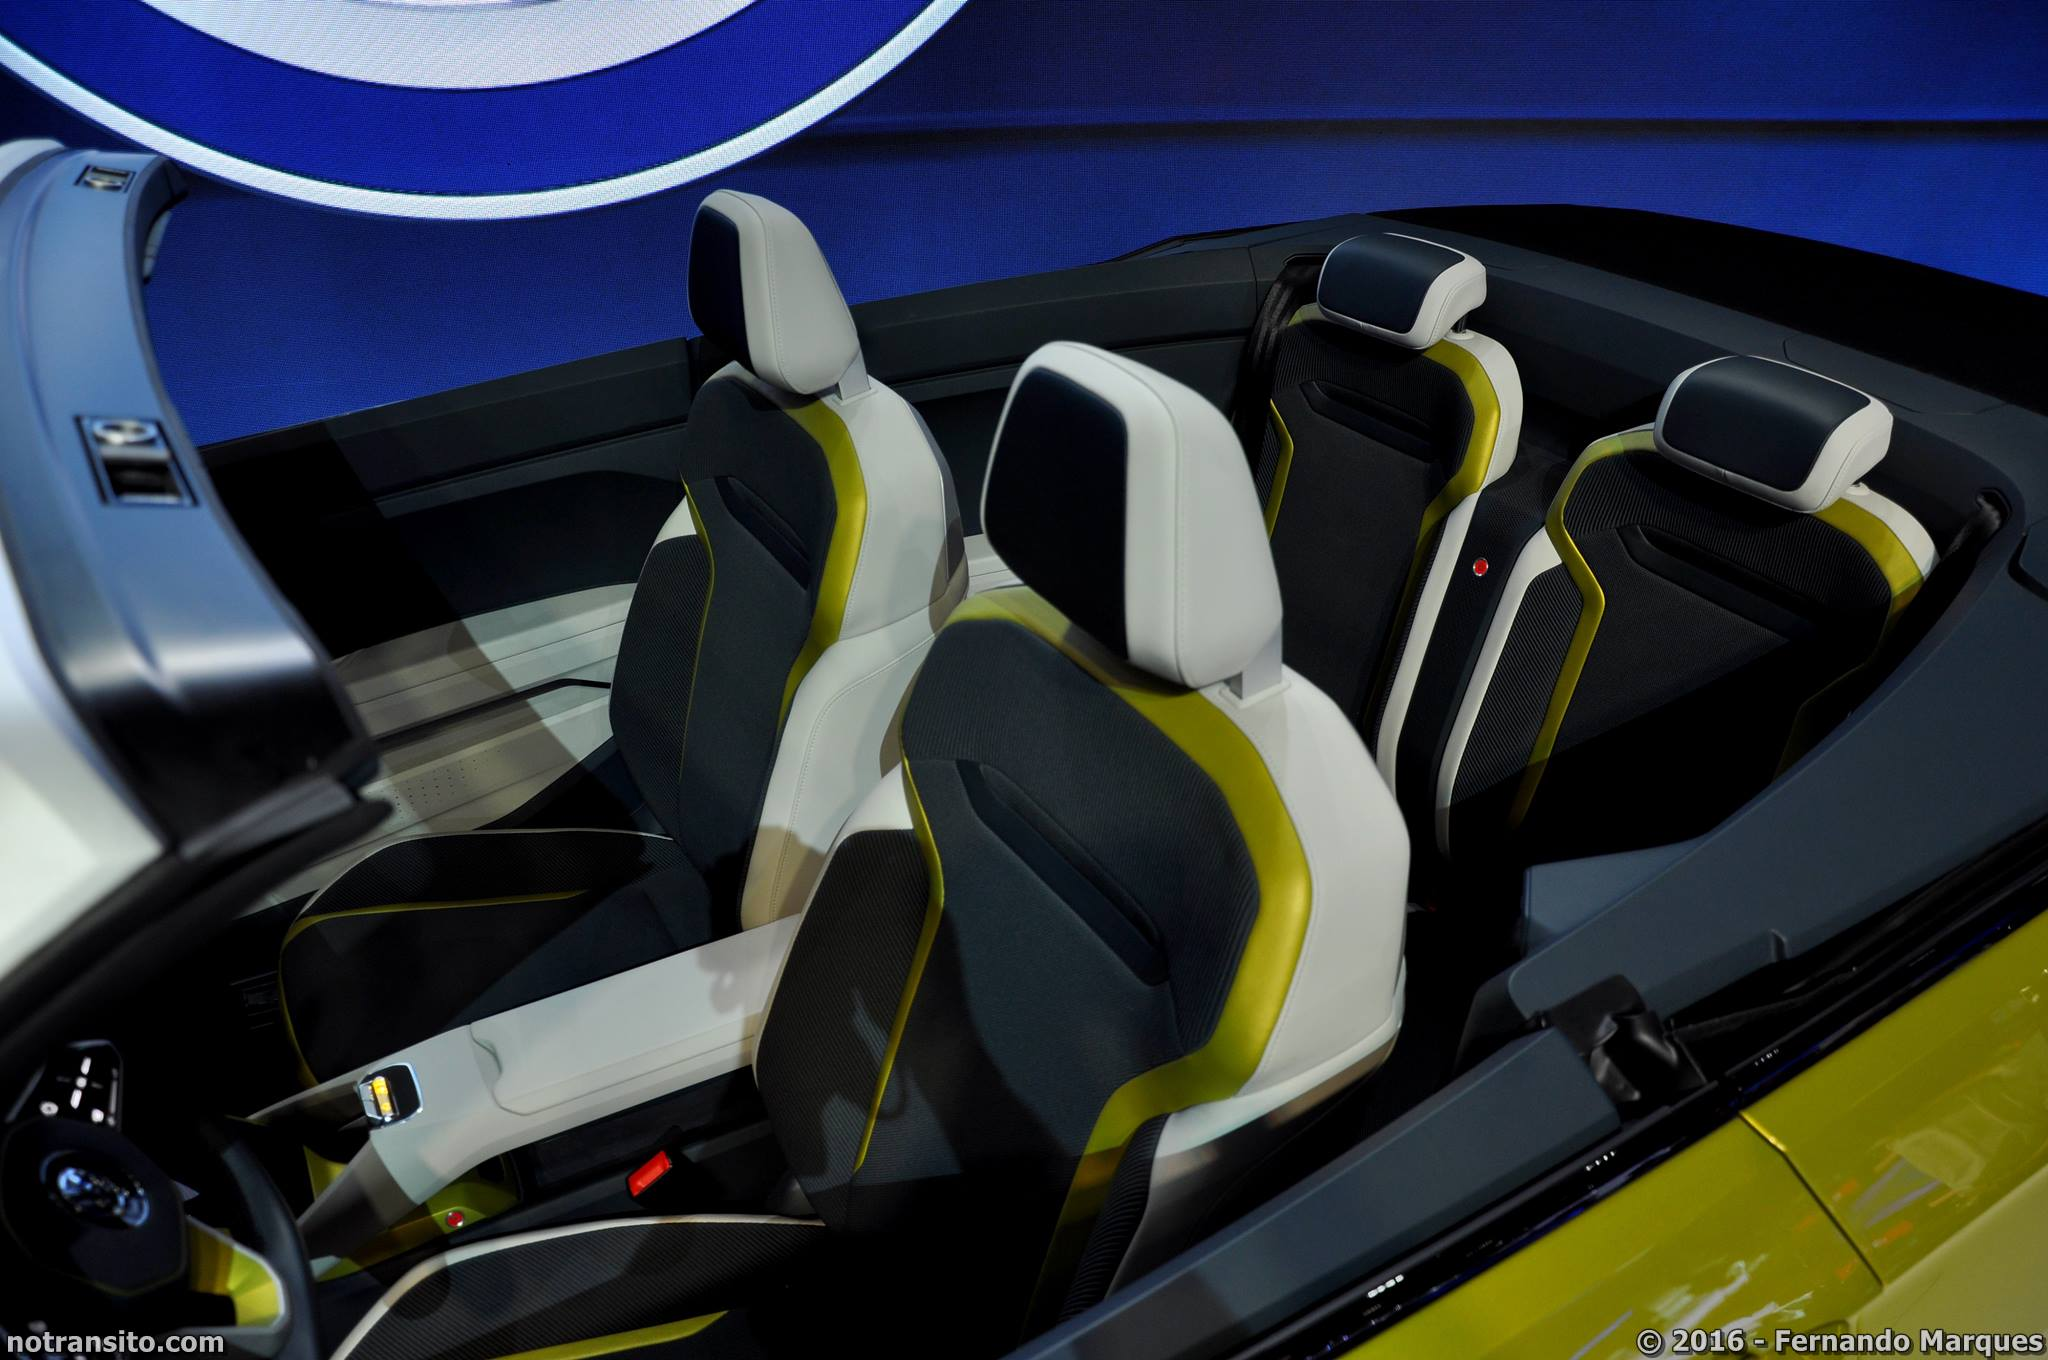 Volkswagen T-Cross Breeze Concept, Salão do Automóvel 2016, 29º Salão do Automóvel de São Paulo